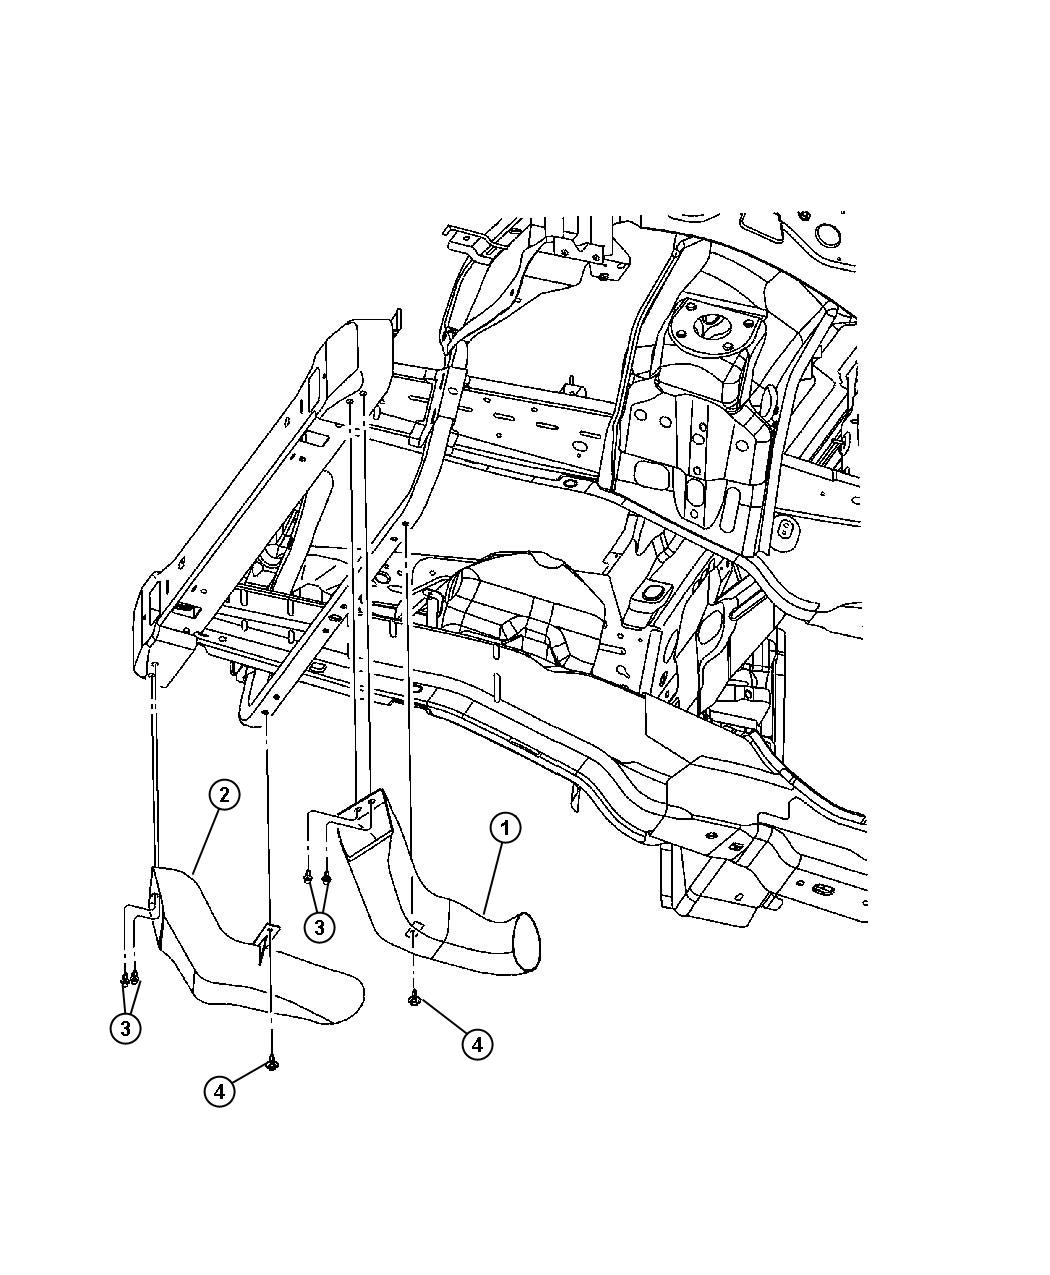 Jeep Cherokee Pin Push Pin M11 4 M8x21 Mounting